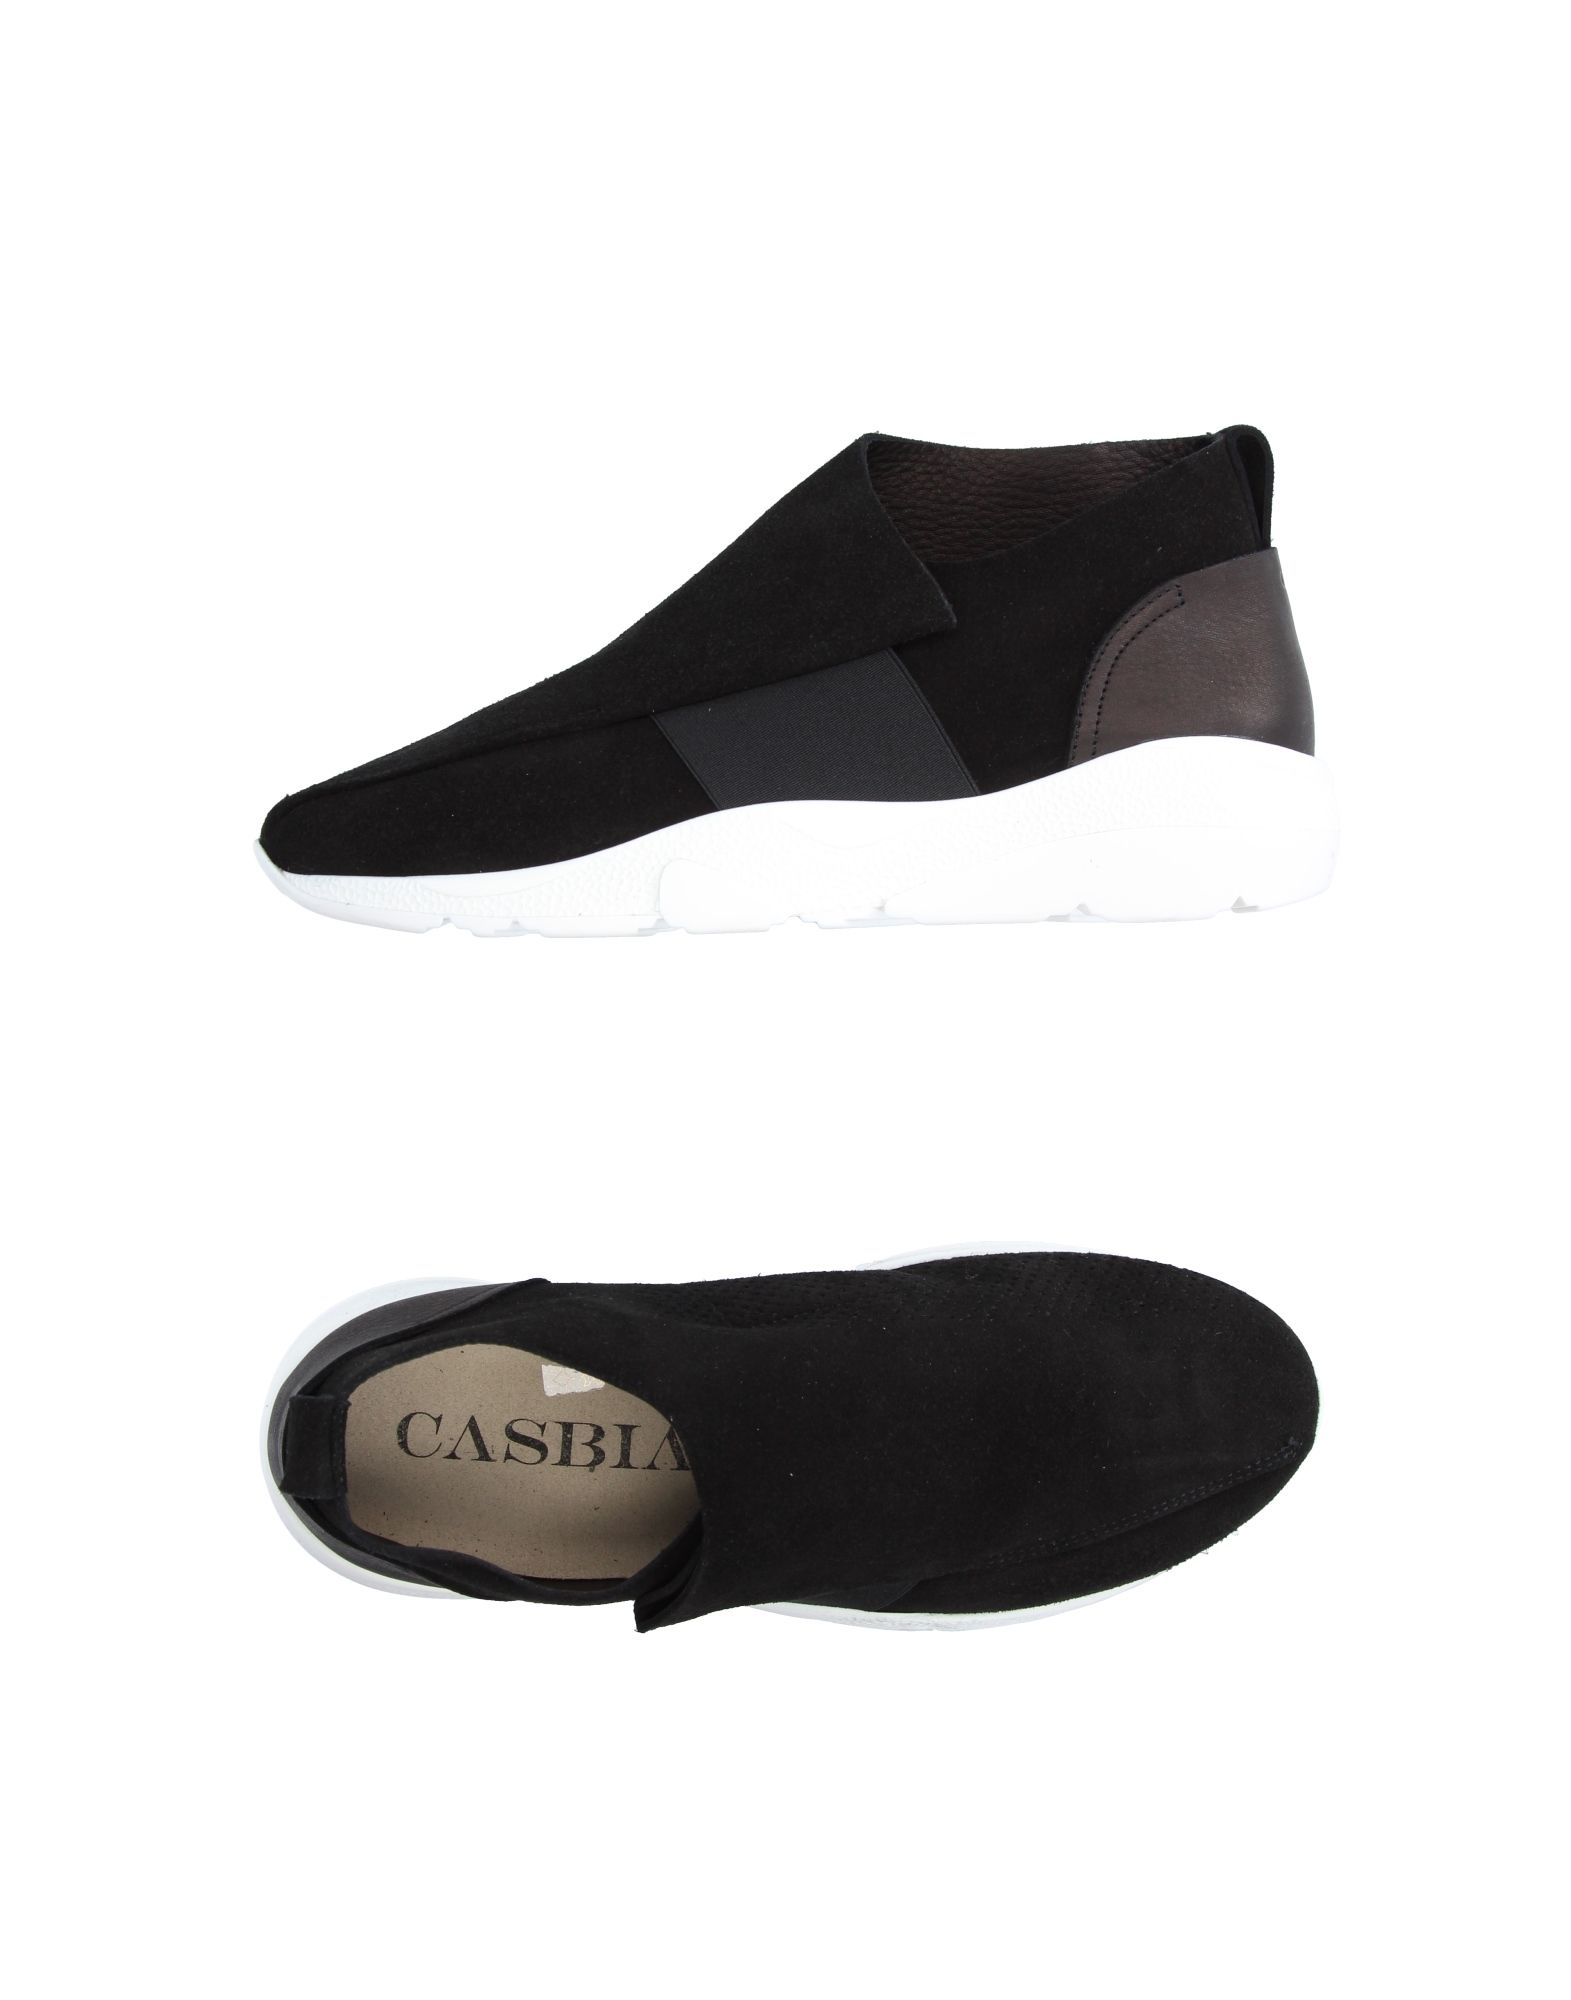 Casbia Casbia  Sneakers Herren  11218137JT ced69d